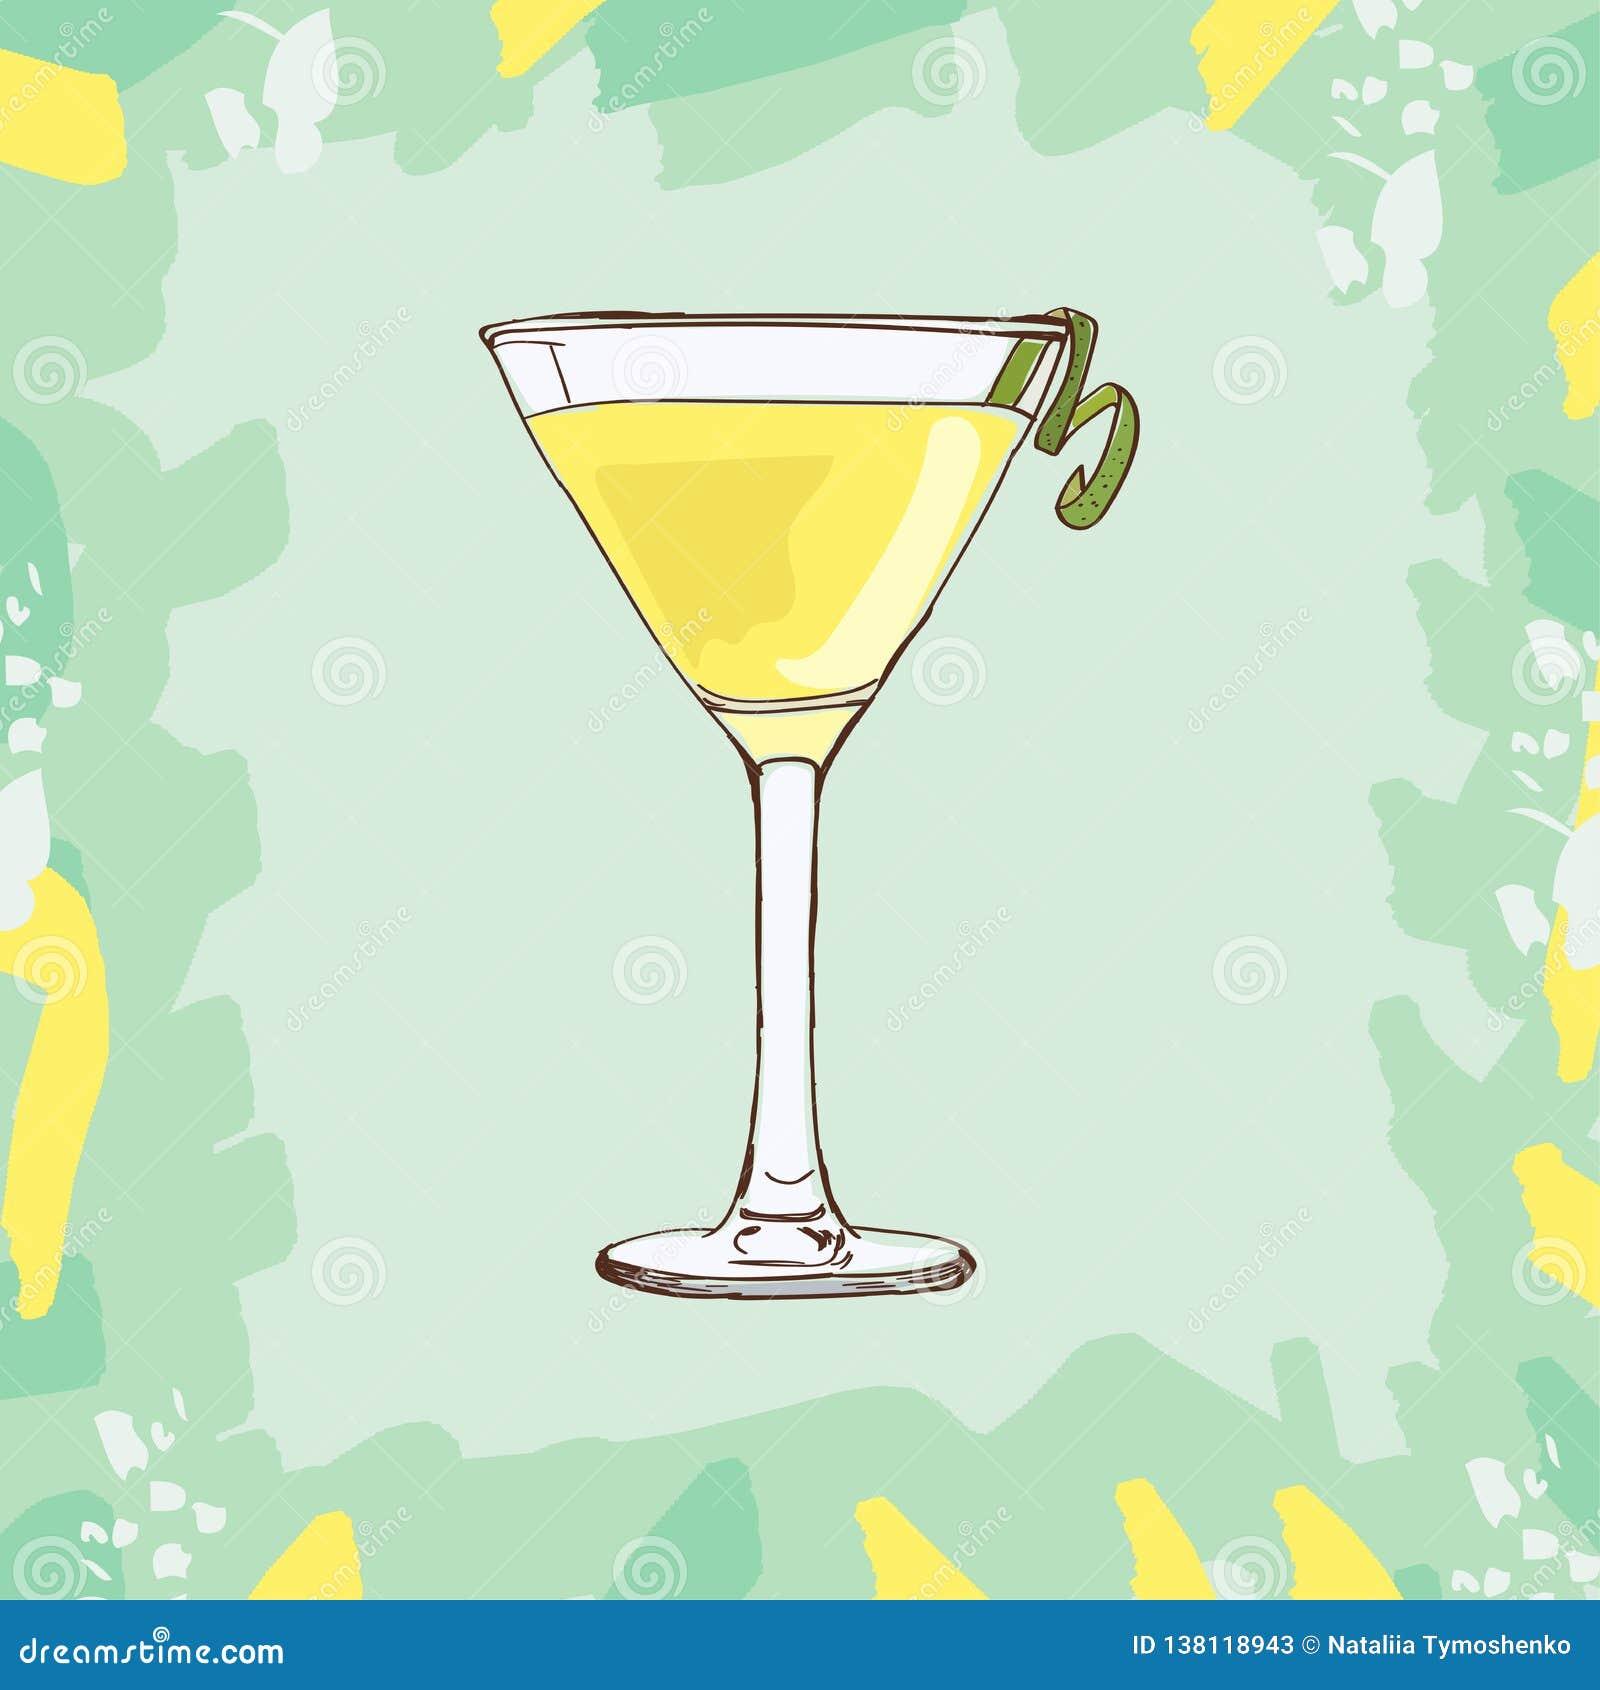 White Lady Cocktail Illustration. Alcoholic Classic Bar